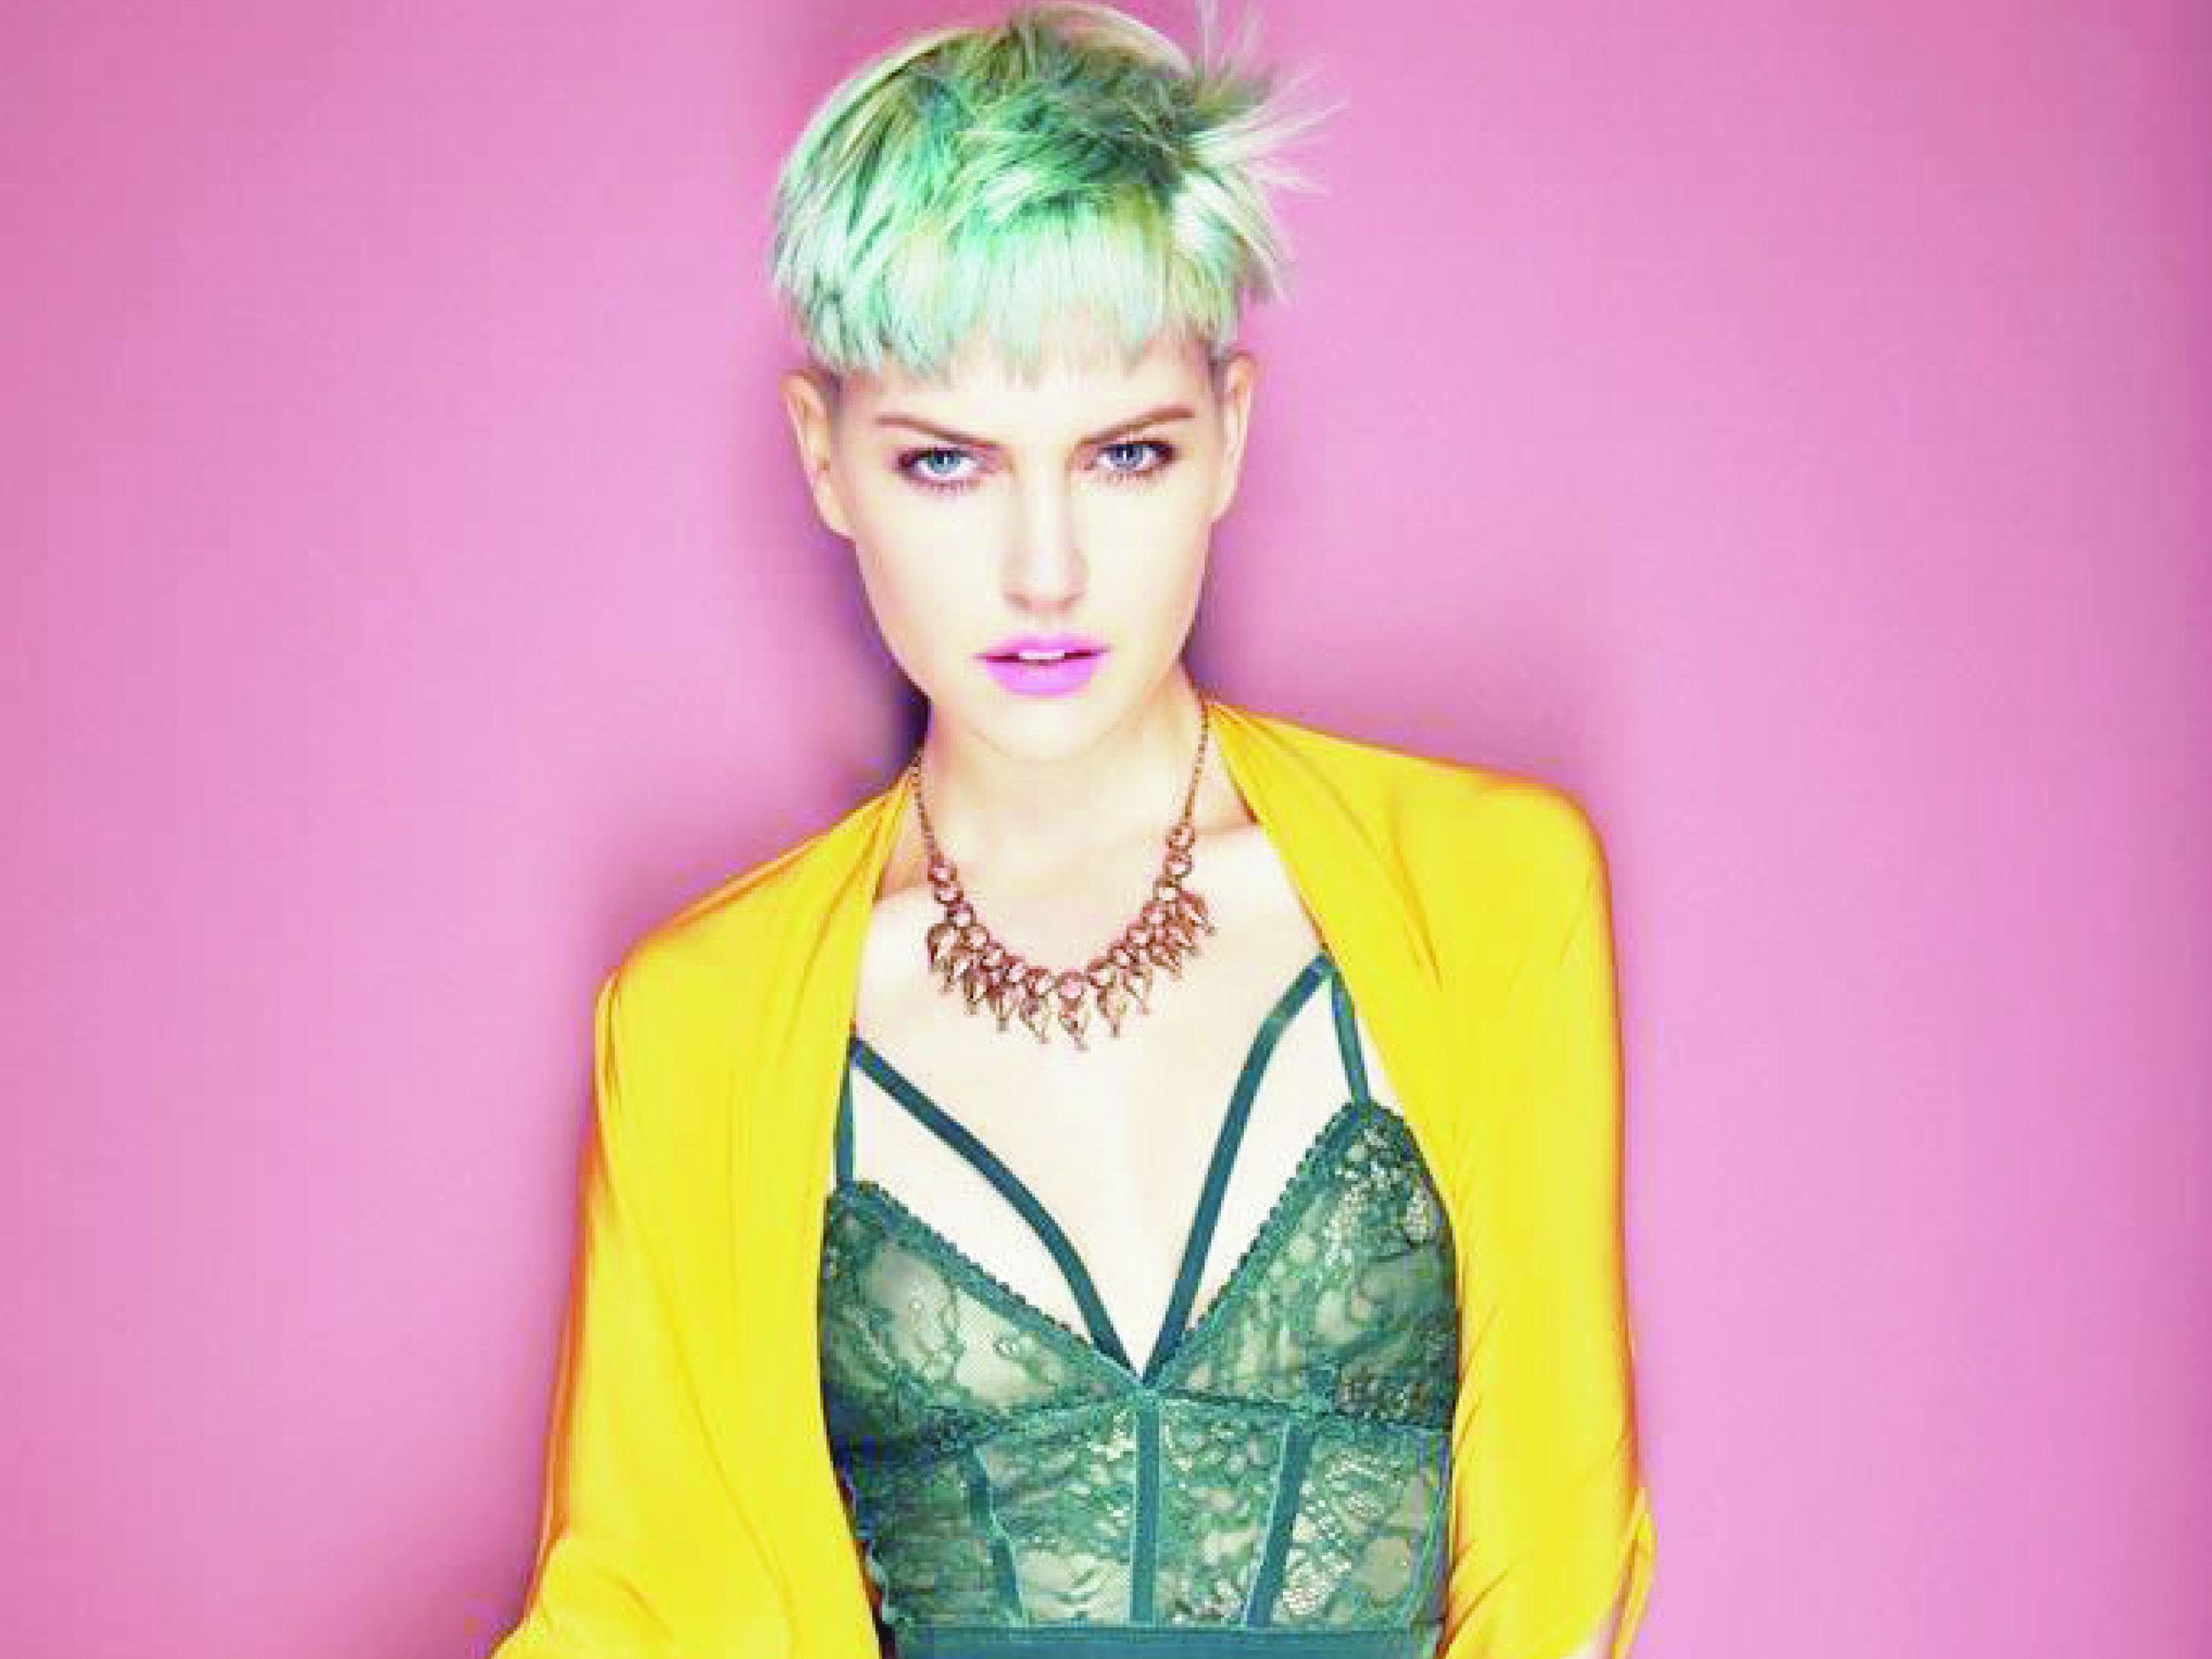 Short blonde w green ling+yel coat 10x7.5 300dpi.jpg